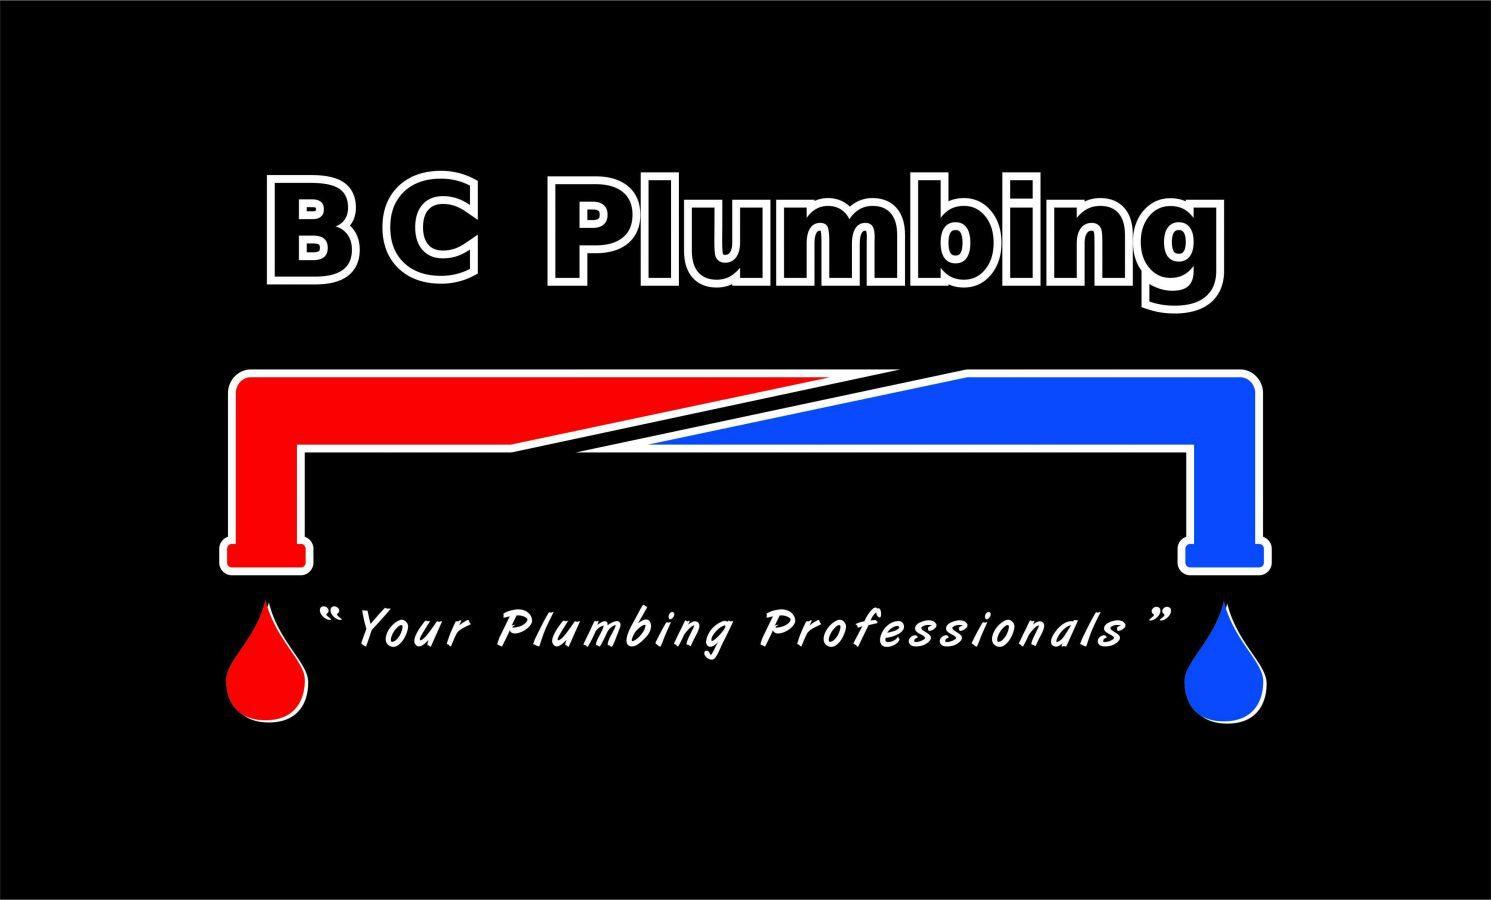 Plumbing Service Ontario